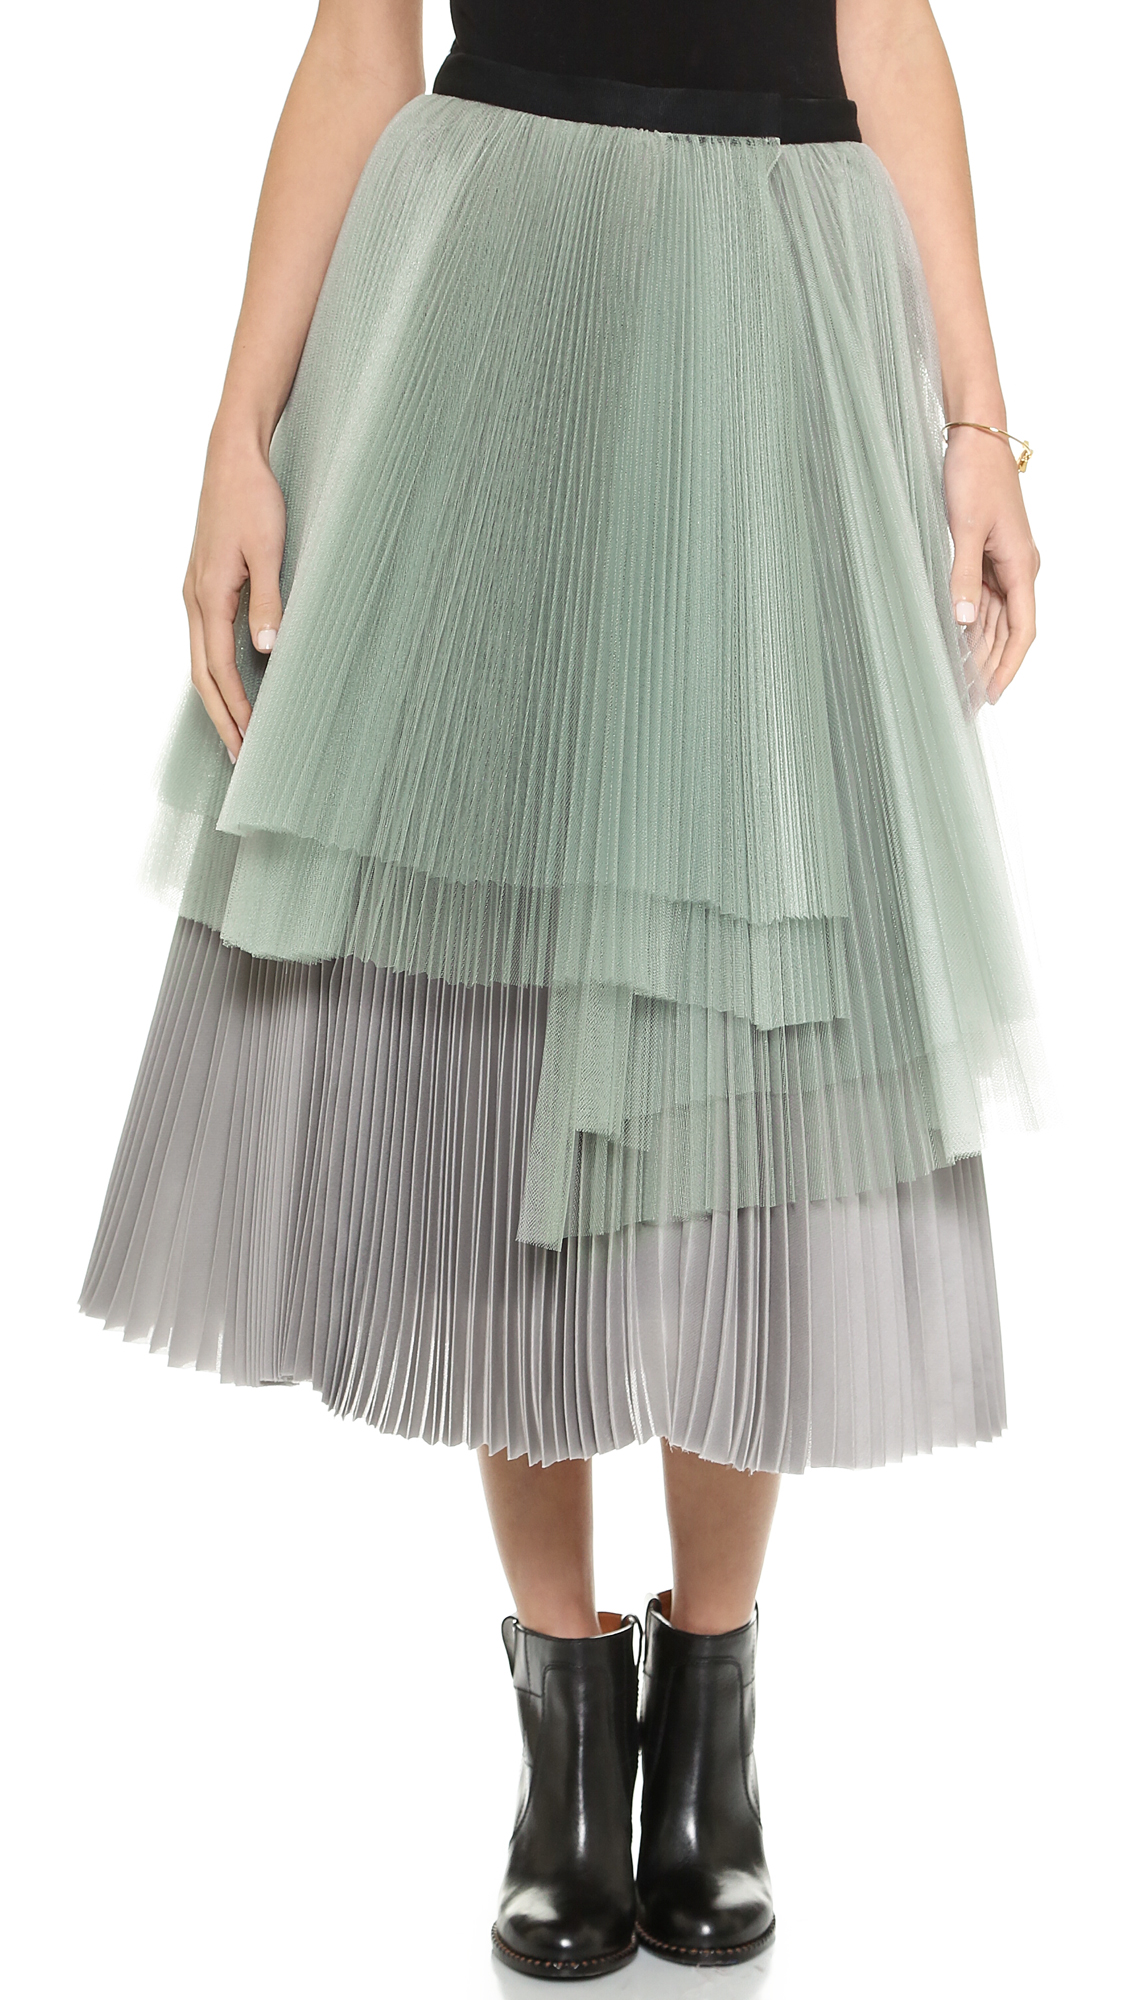 51b78641a1 Marc by Marc Jacobs Mayu Organdy Petticoat Skirt | SHOPBOP